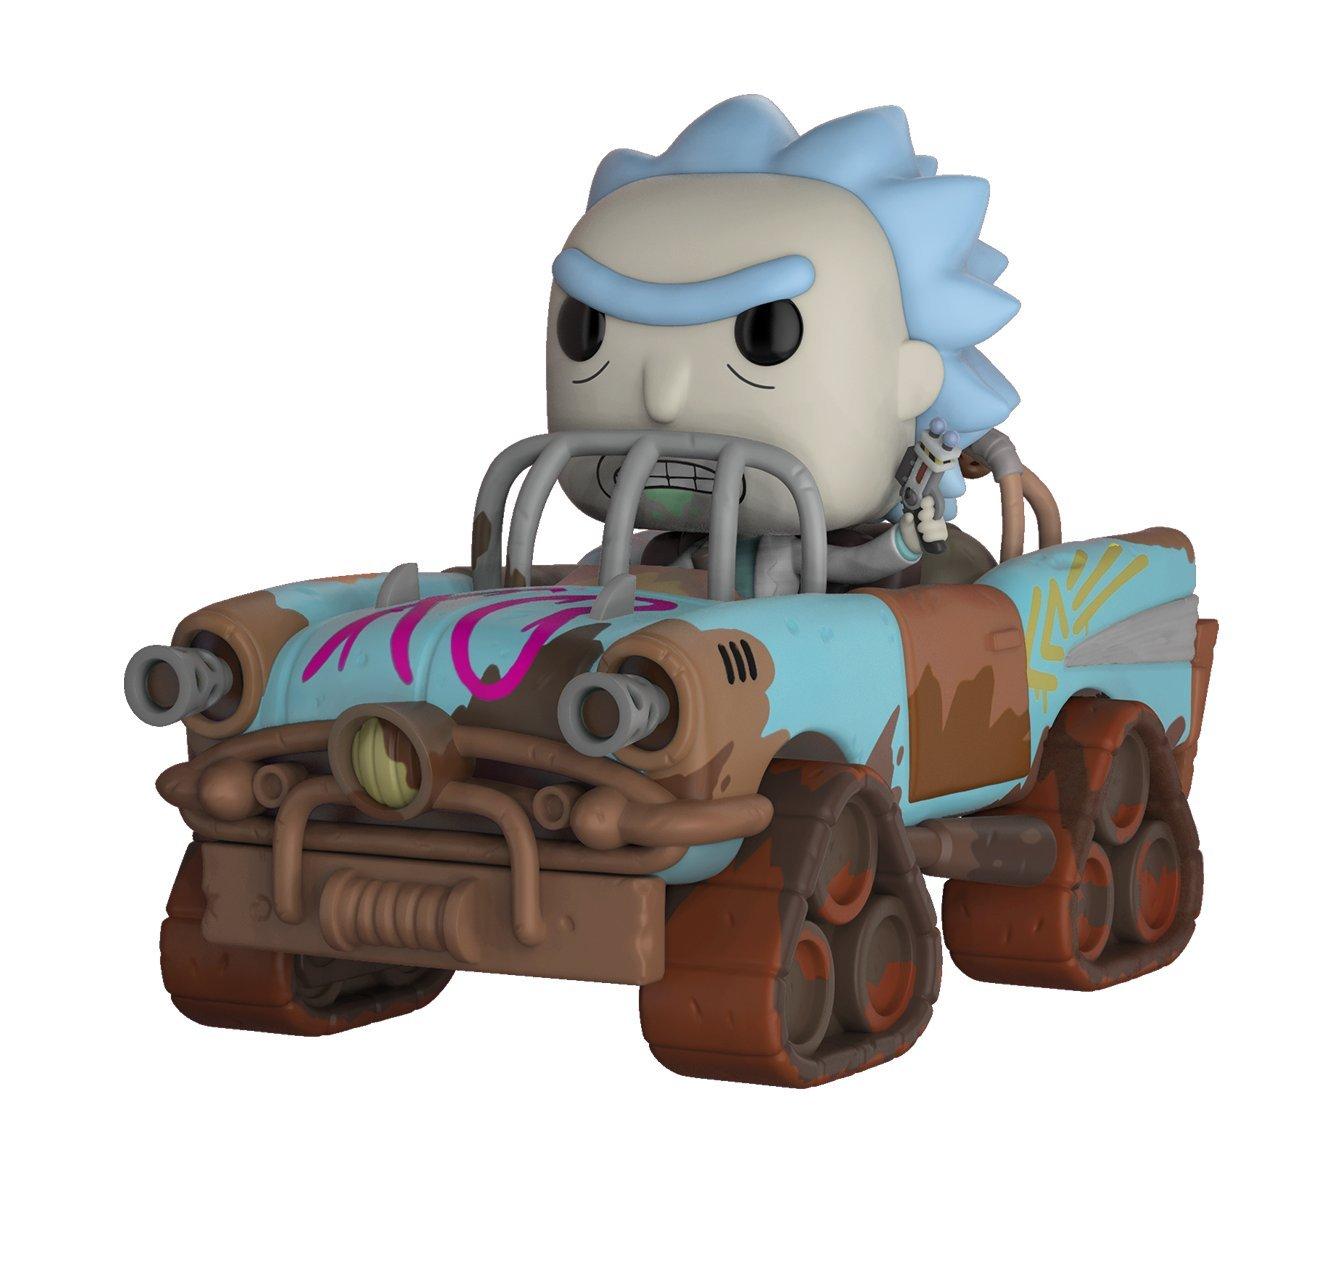 Funko Pop Rick /& Morty Mad Max Rick Collectible Figure 28456 Accessory Toys /& Games Rides